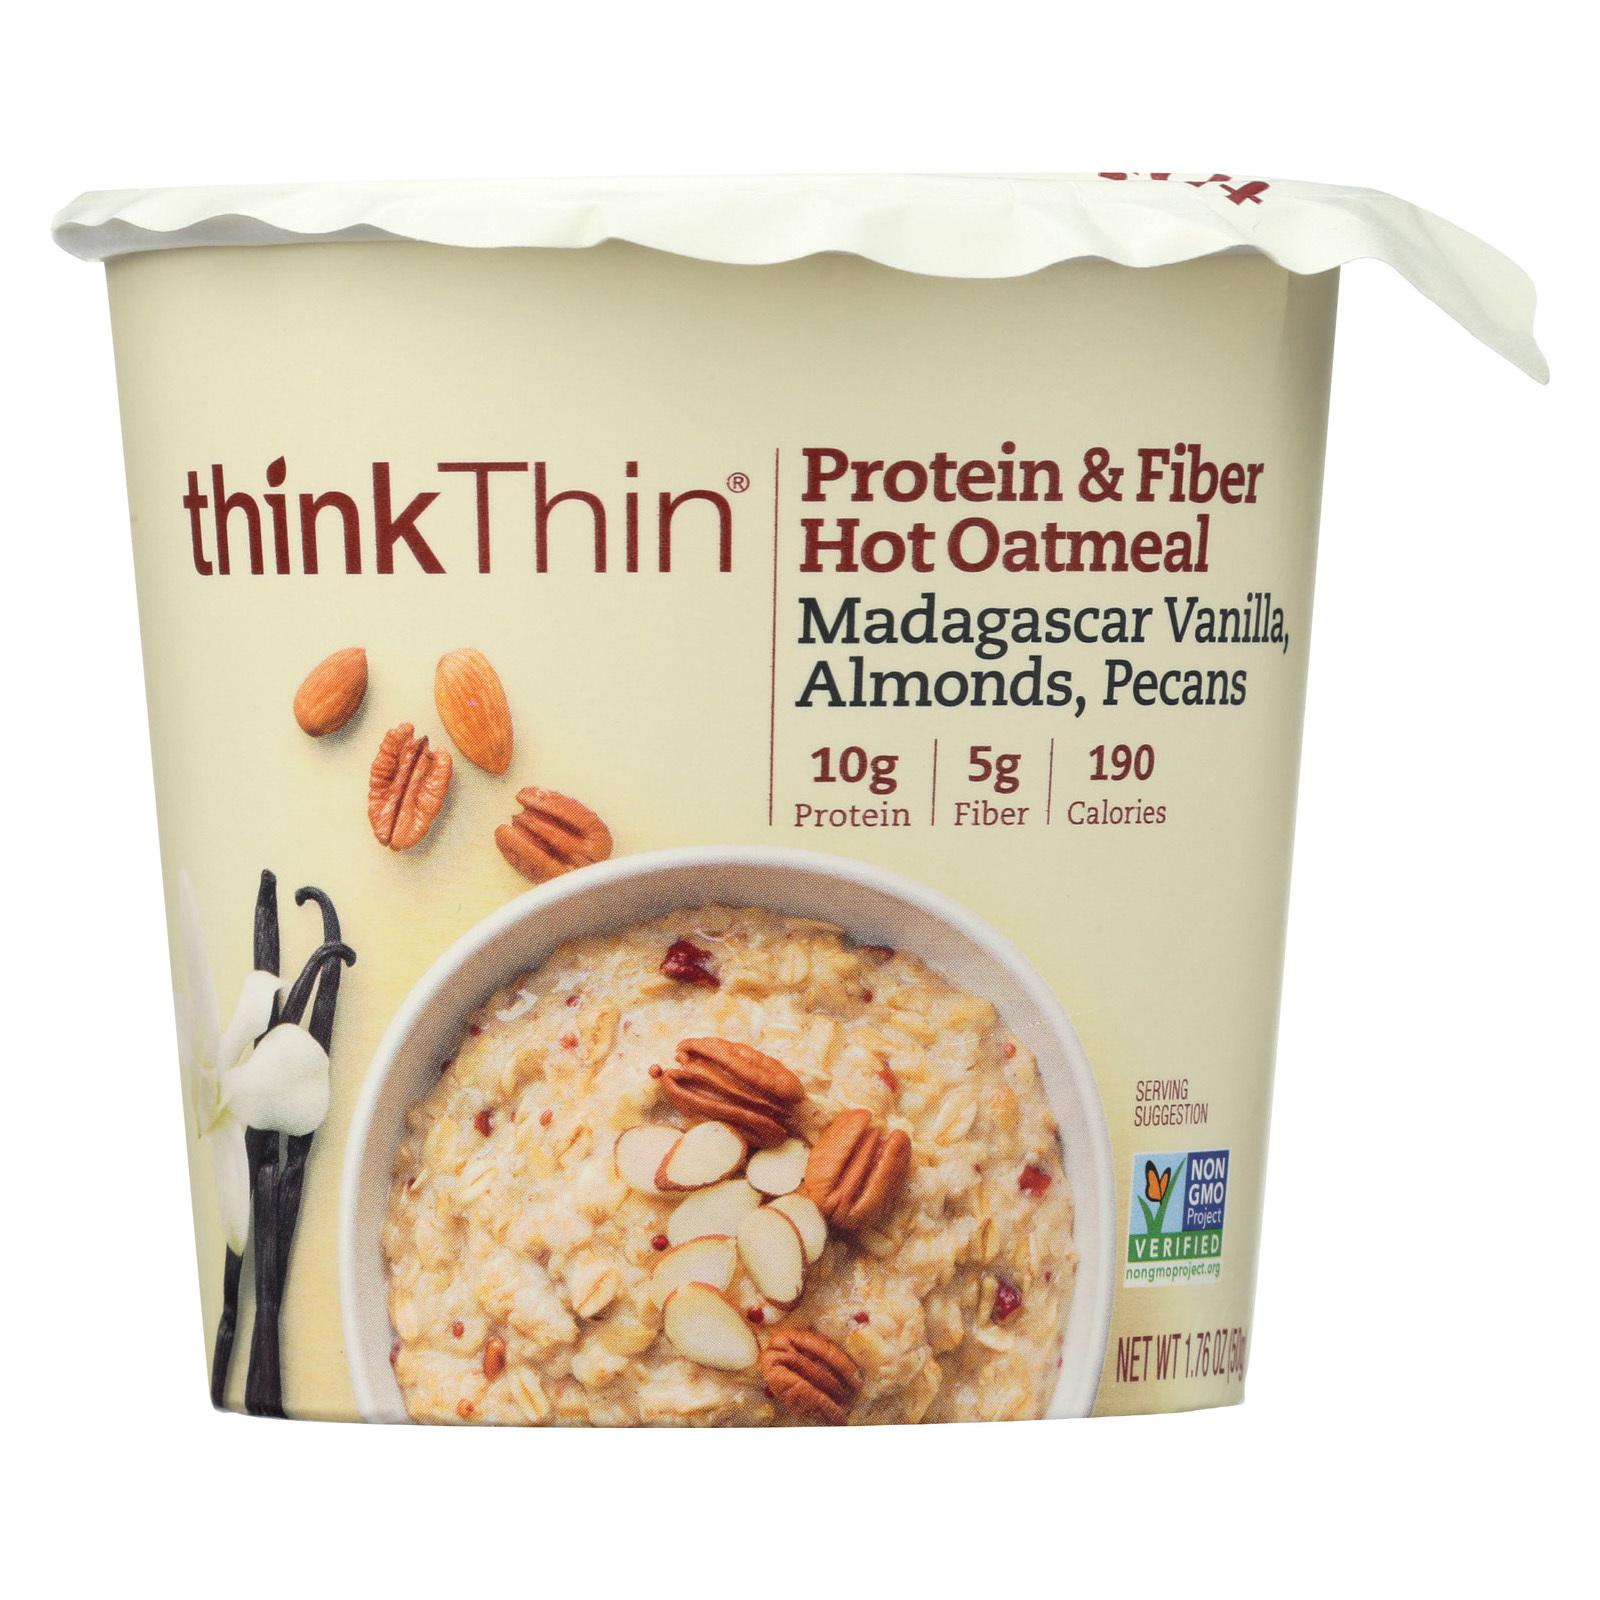 Think! Thin Protein & Fiber Hot Oatmeal -Vanilla - Almonds - Pecan - Case of 6 - 1.76 oz